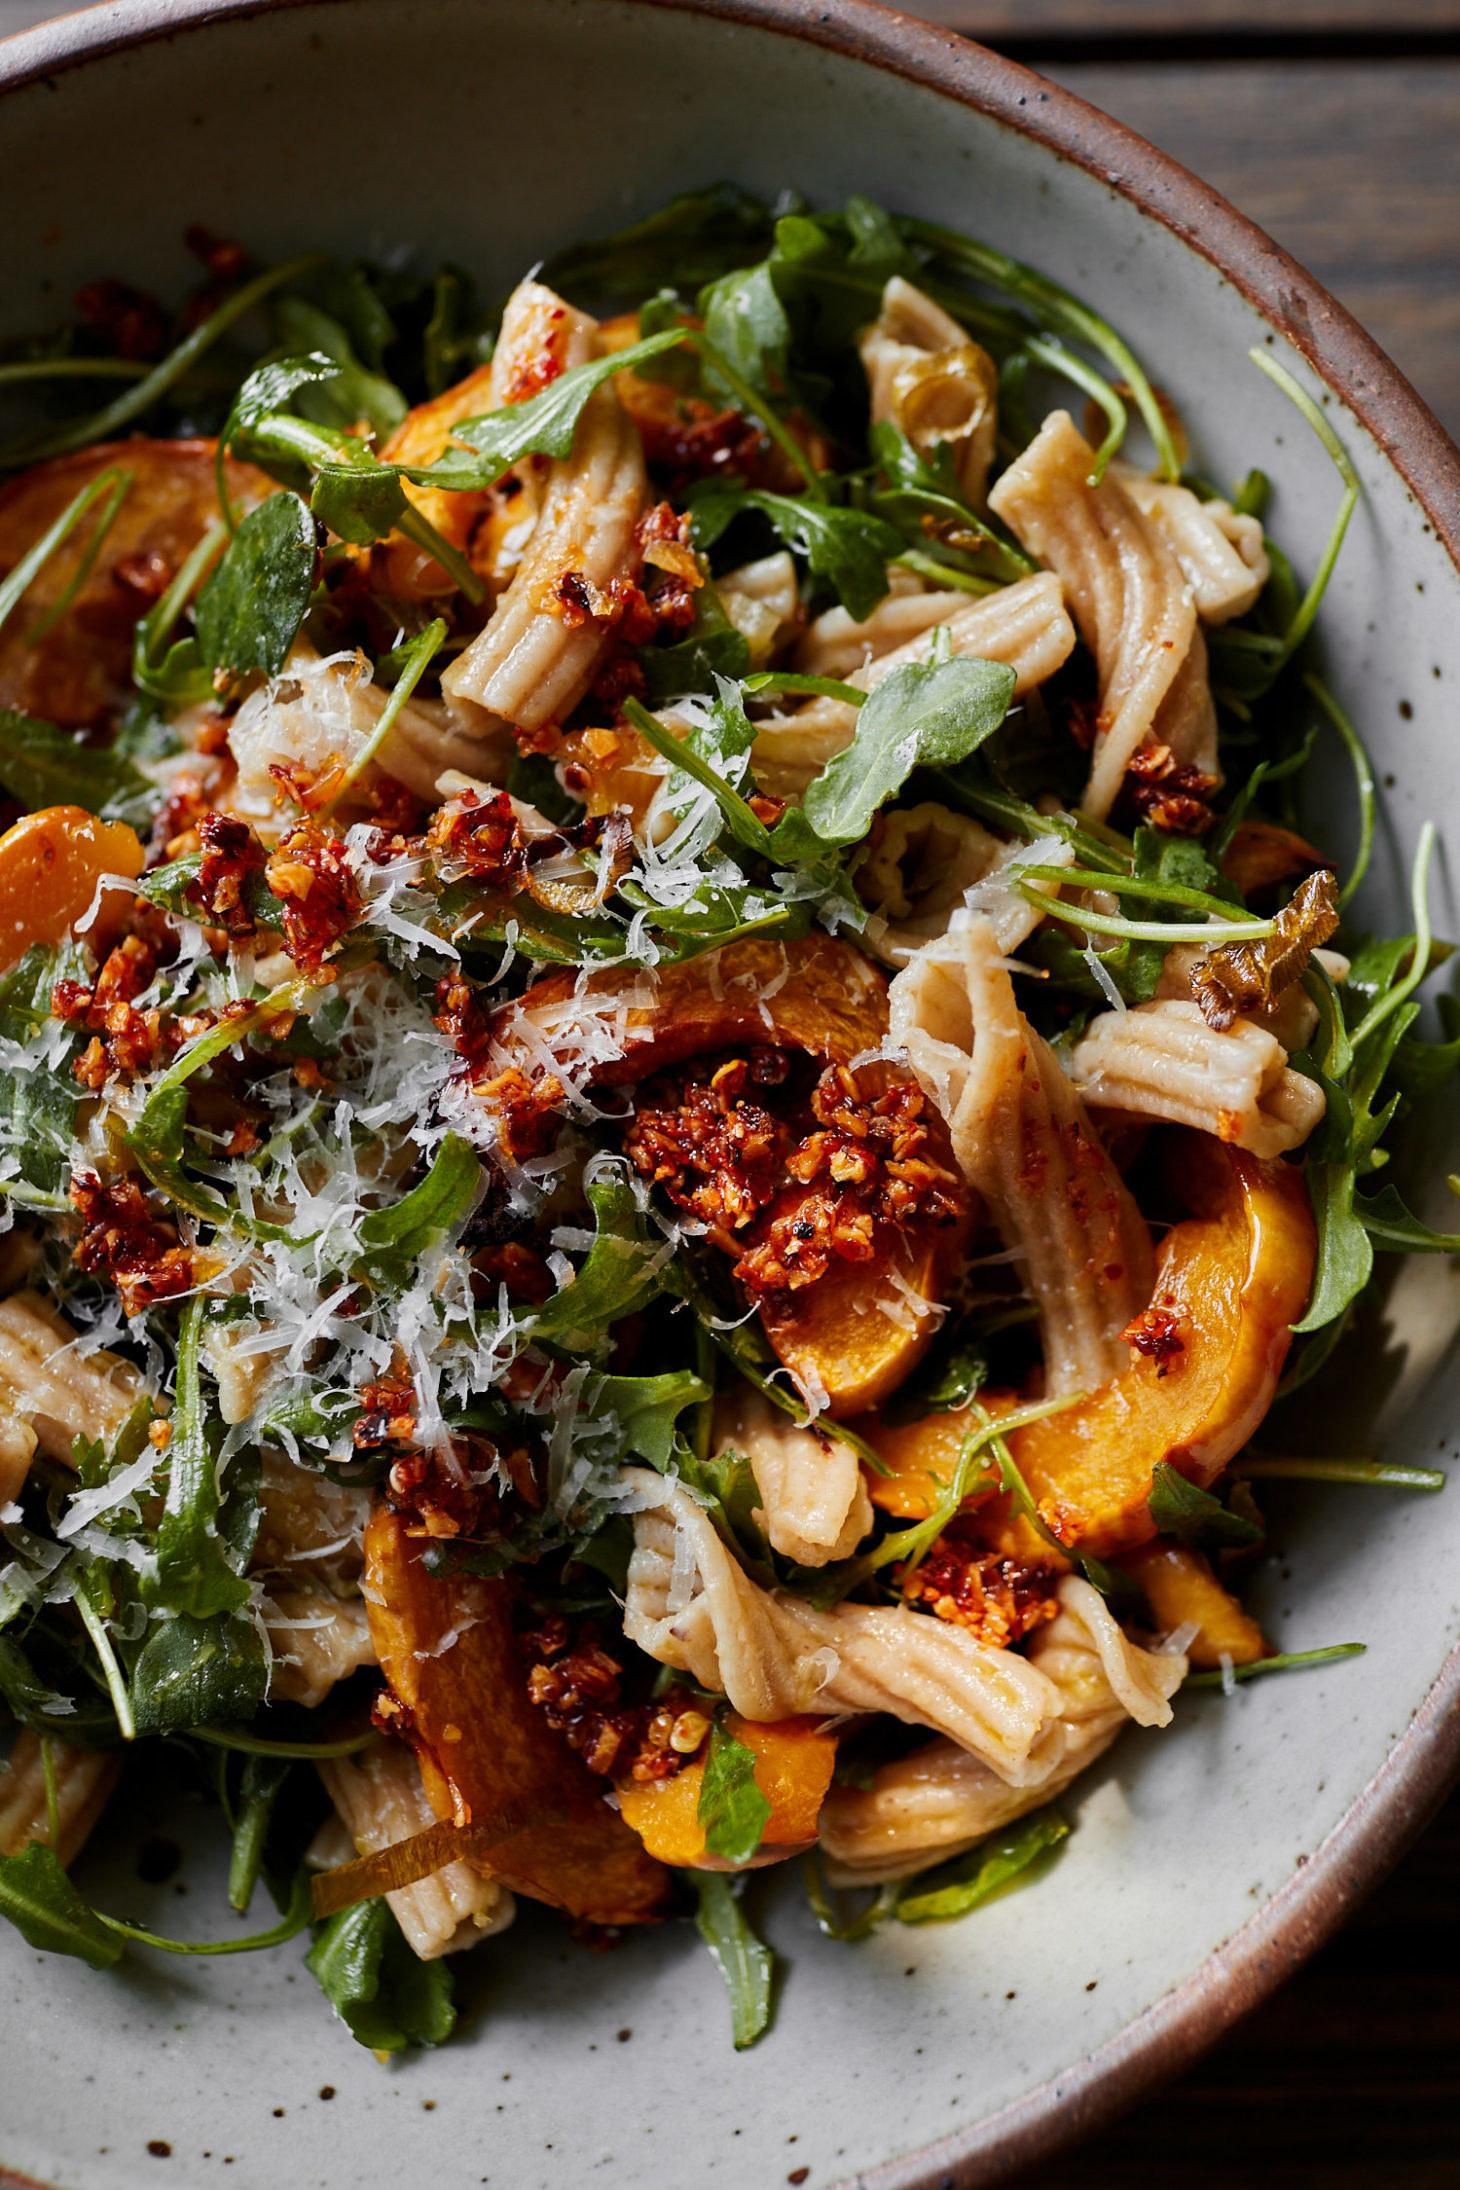 A bowl of pasta with arugula, delicata squash, and walnuts.